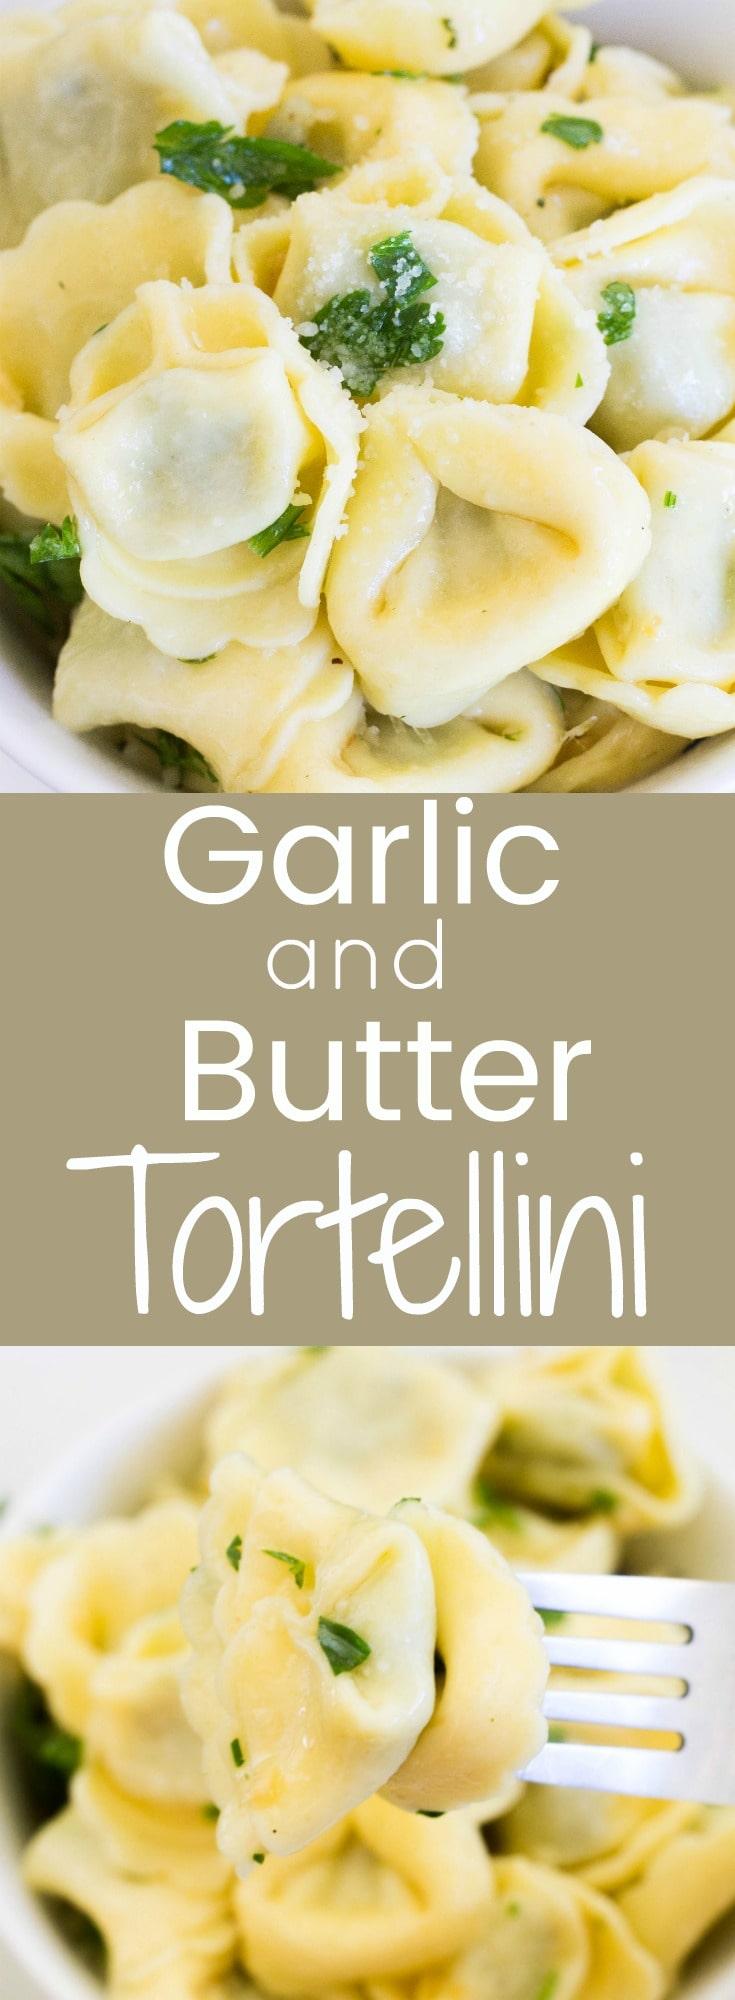 Garlic and Butter Tortellini